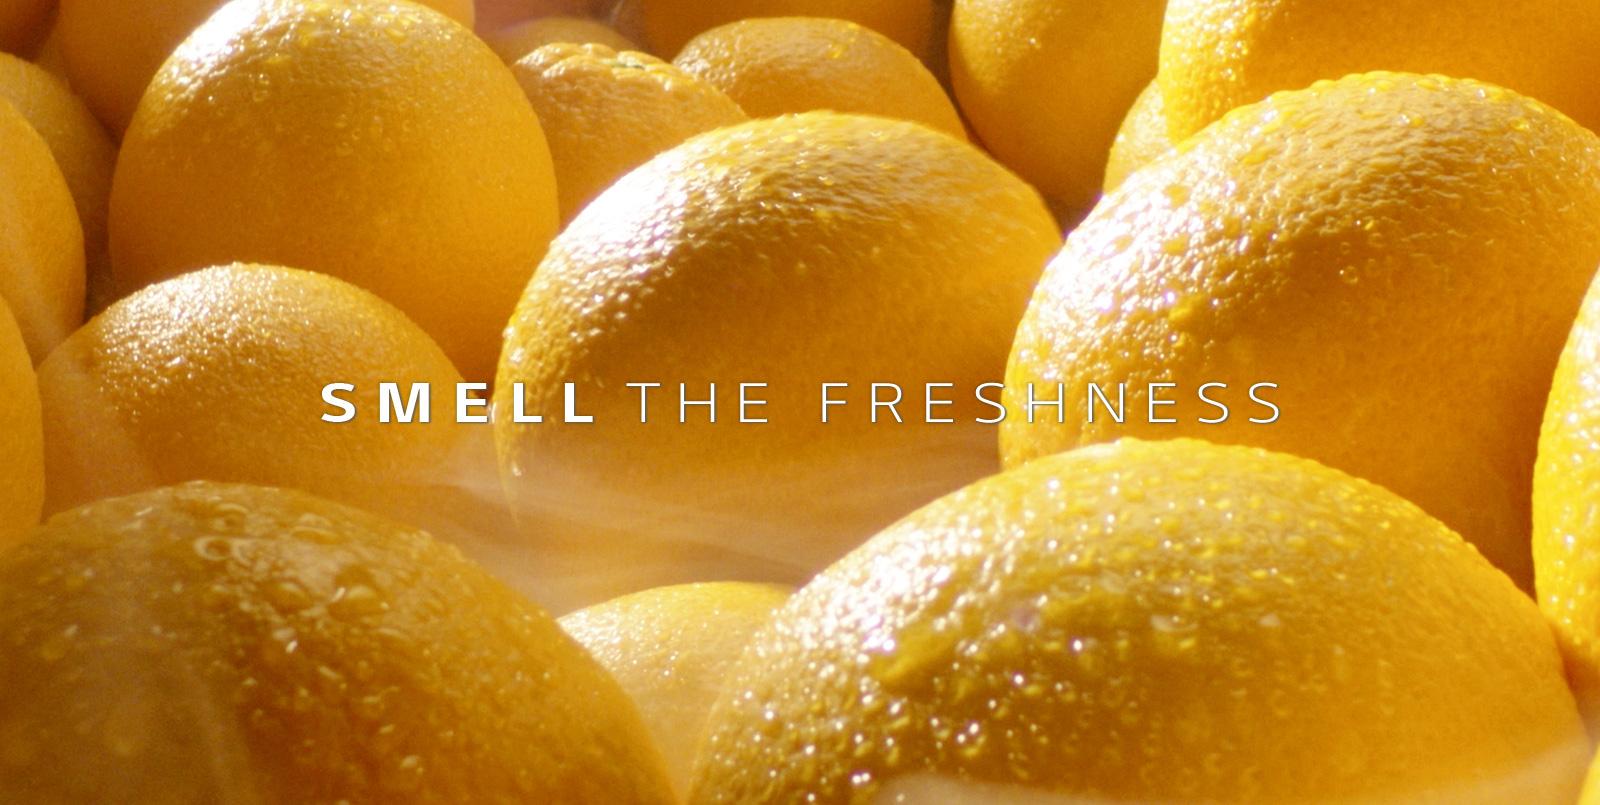 a close up of a bowl of oranges